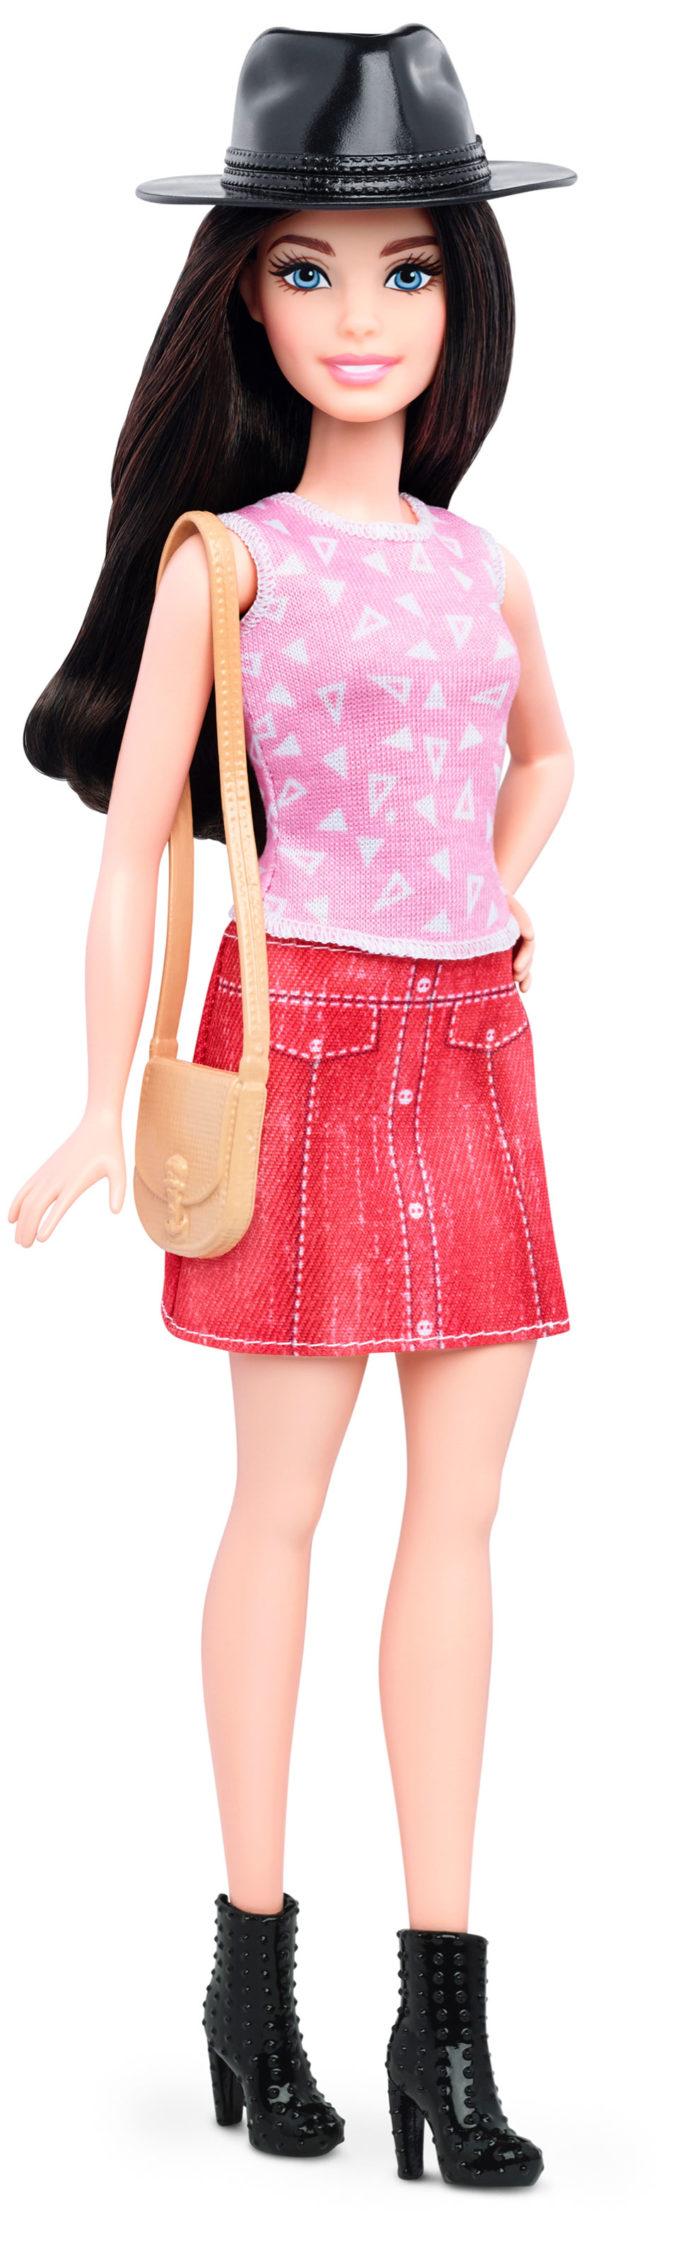 barbie-nuove-curvy-bassa-alta-realistica-02